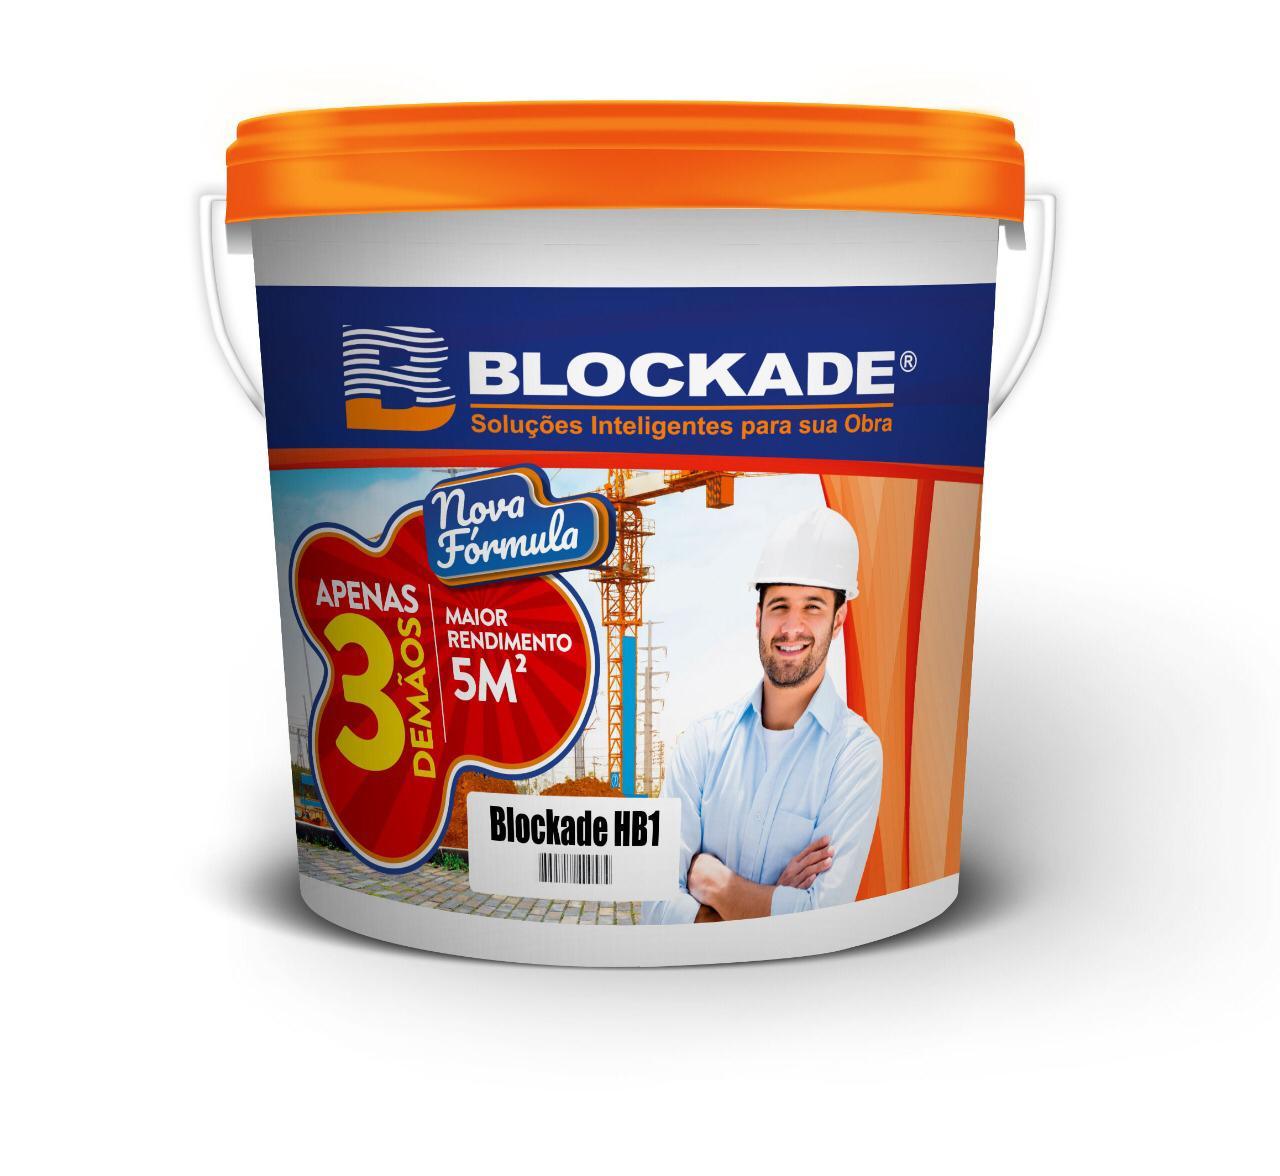 IMPERMEABILIZANTE BLOCKADE HB-1 BRANCO 22KG